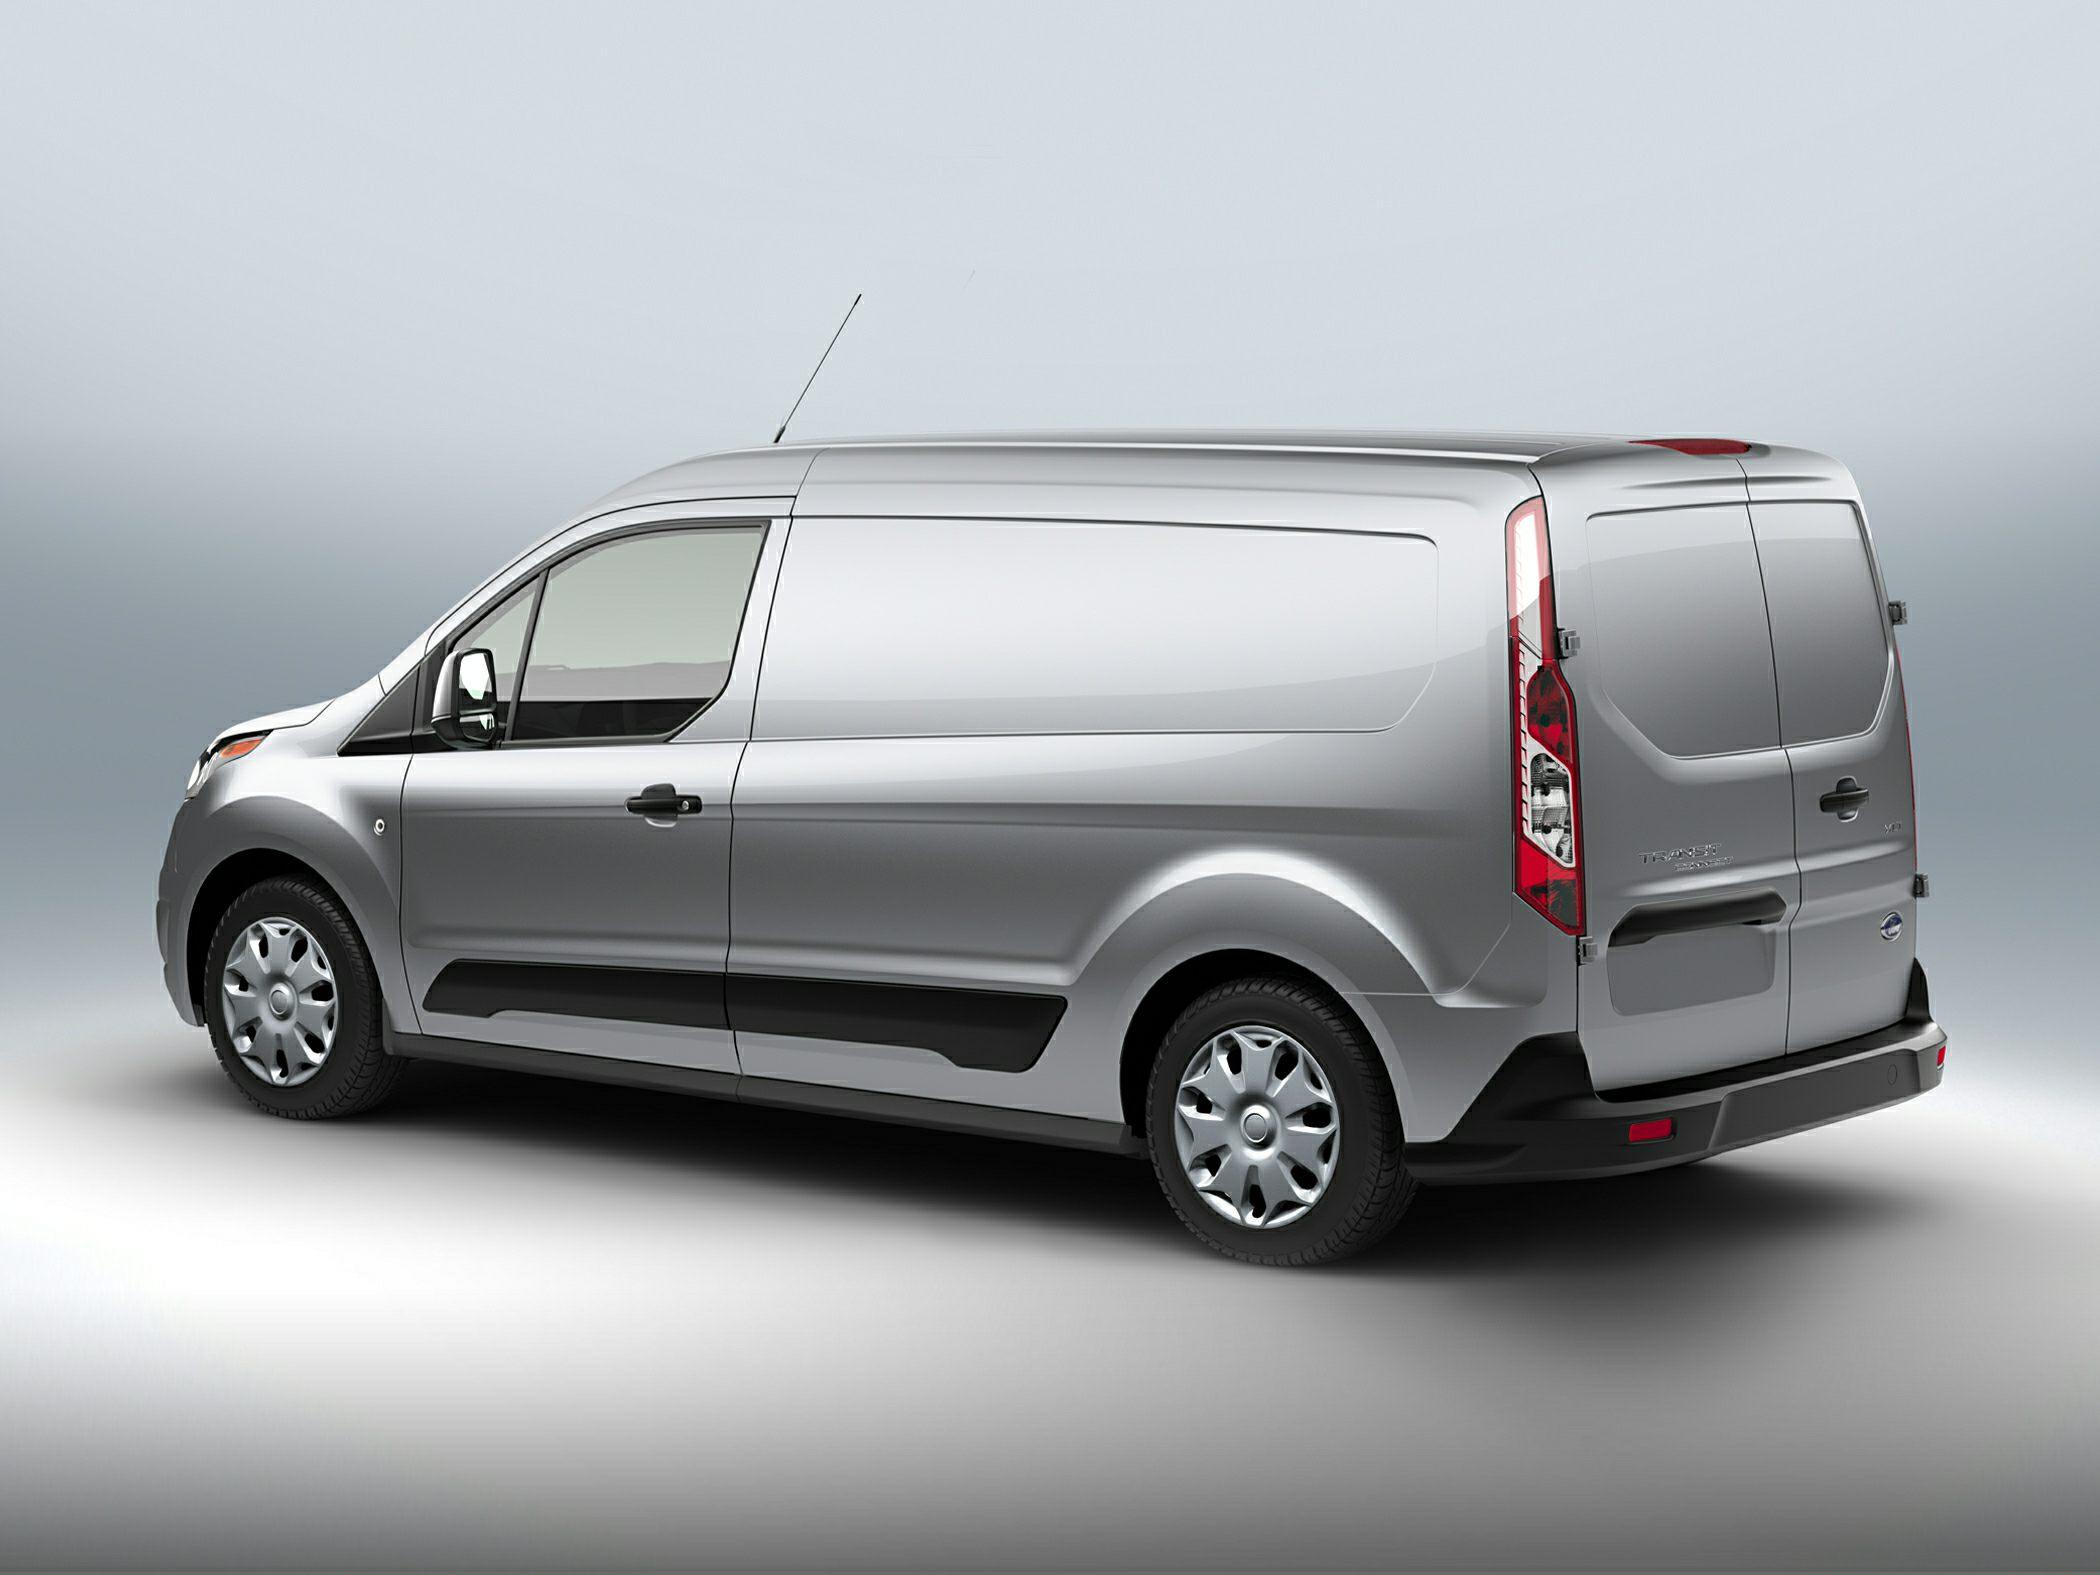 2017 ford transit connect deals prices incentives. Black Bedroom Furniture Sets. Home Design Ideas